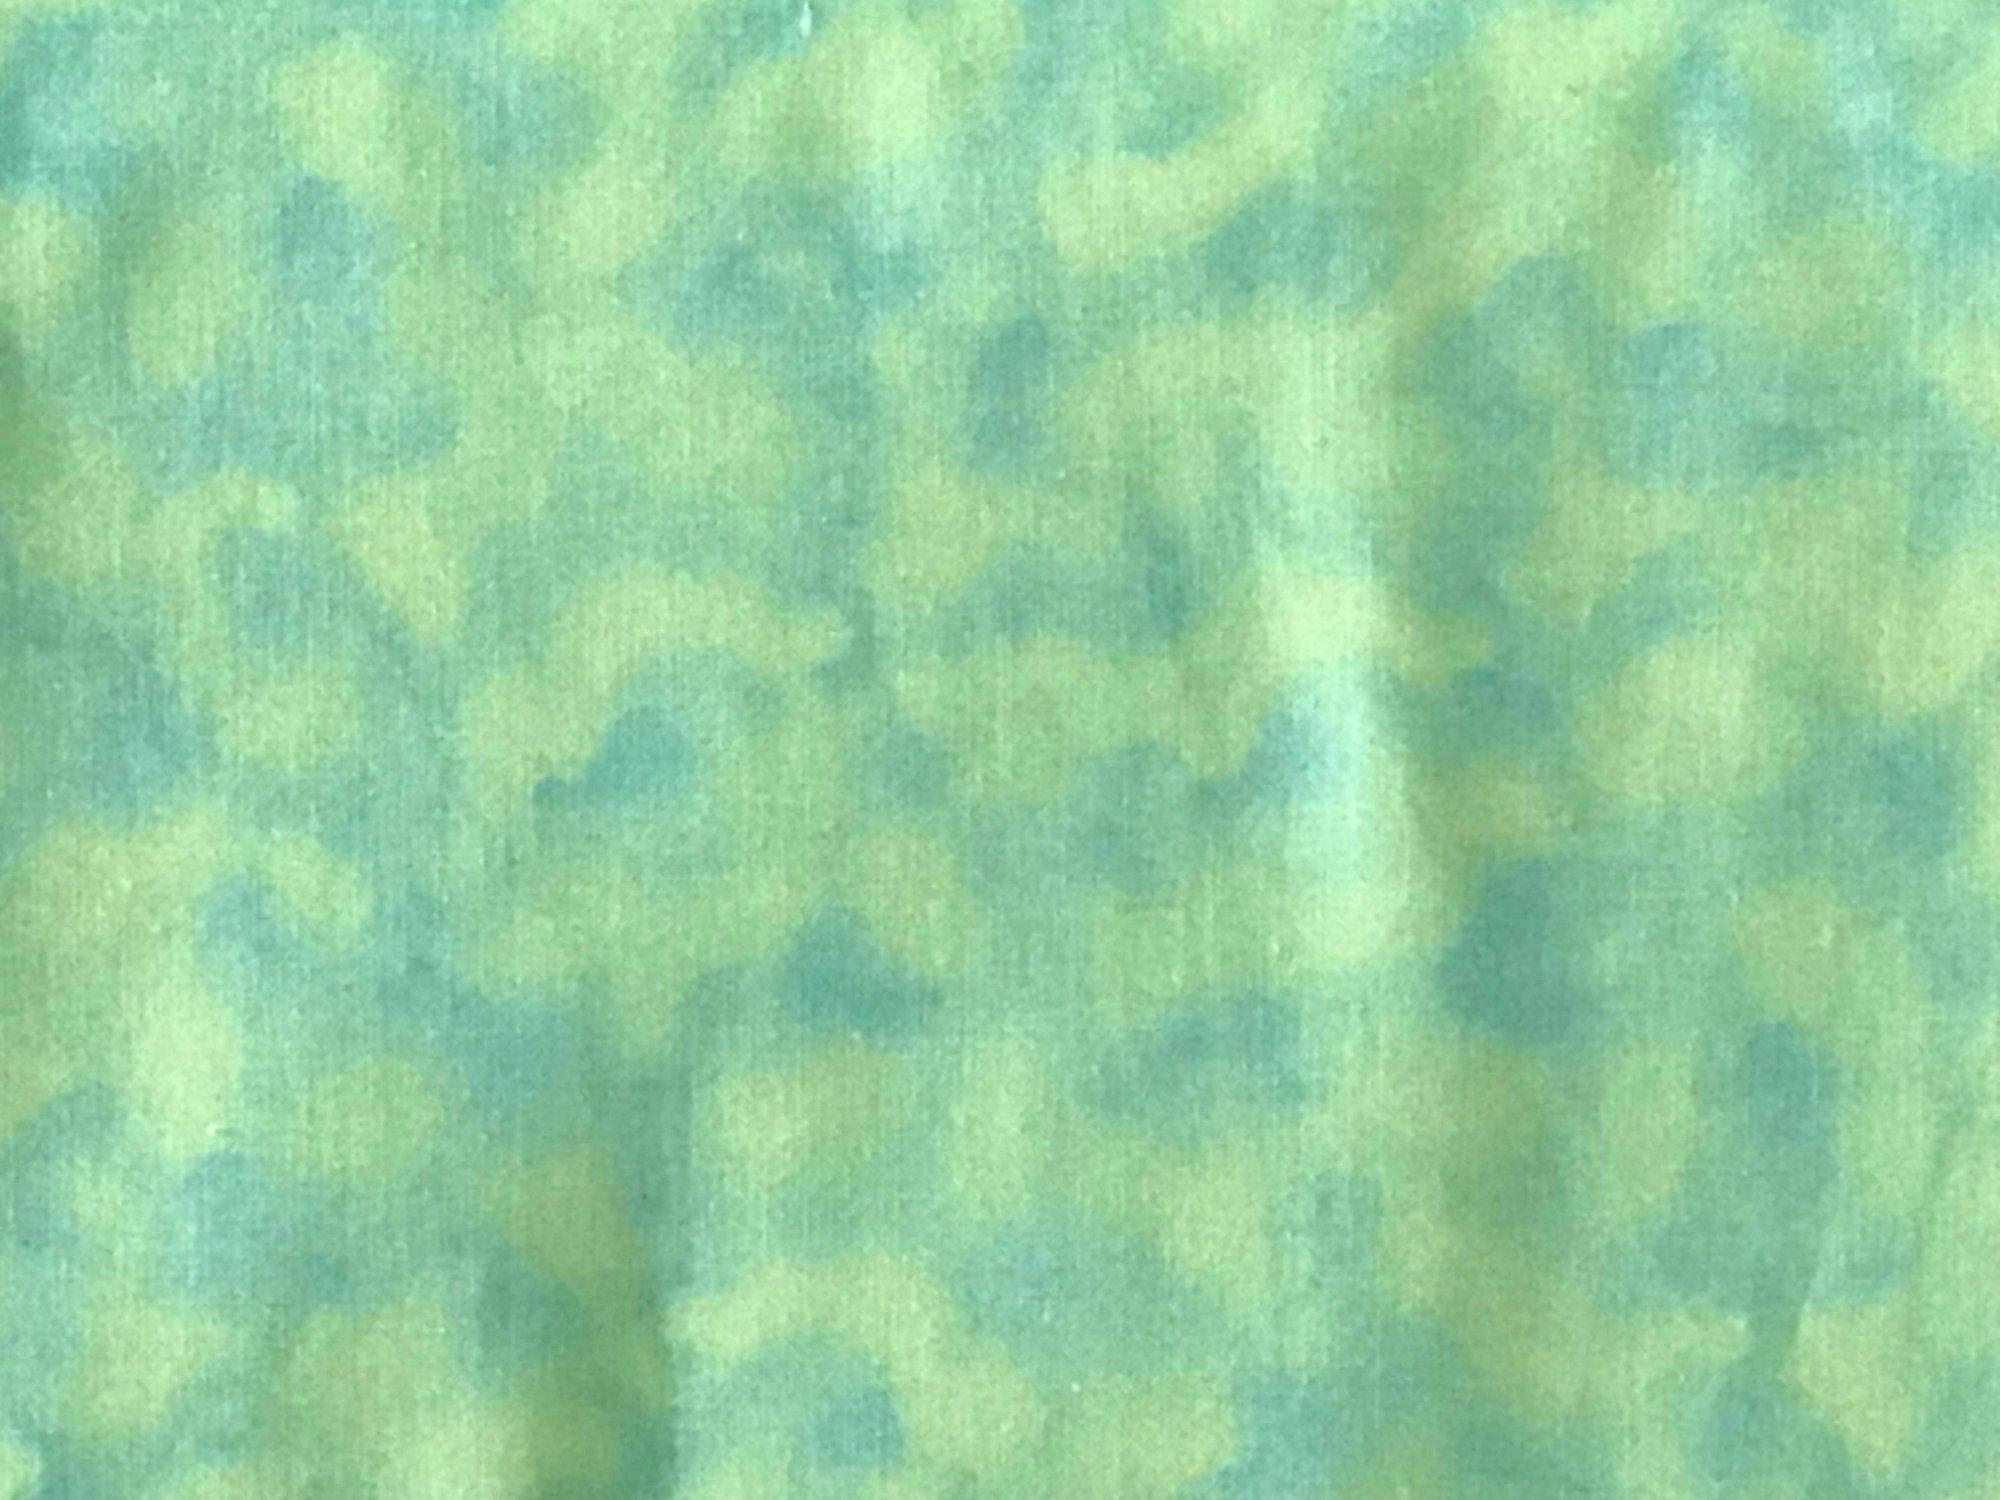 Girly-O-Saurus Blue/Green Blender